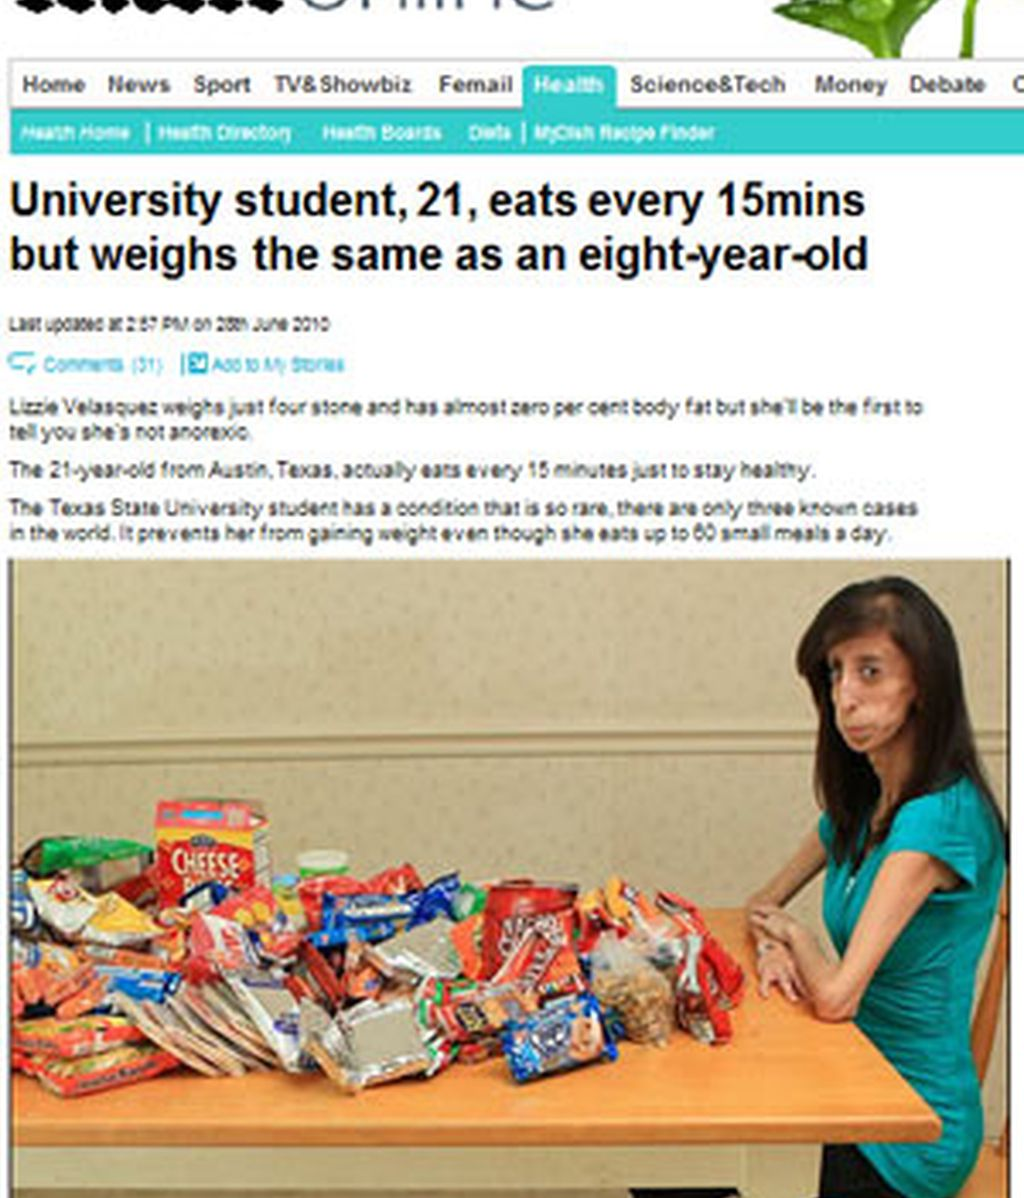 Lizzie Velazques, en una imagen del Daily Mail.